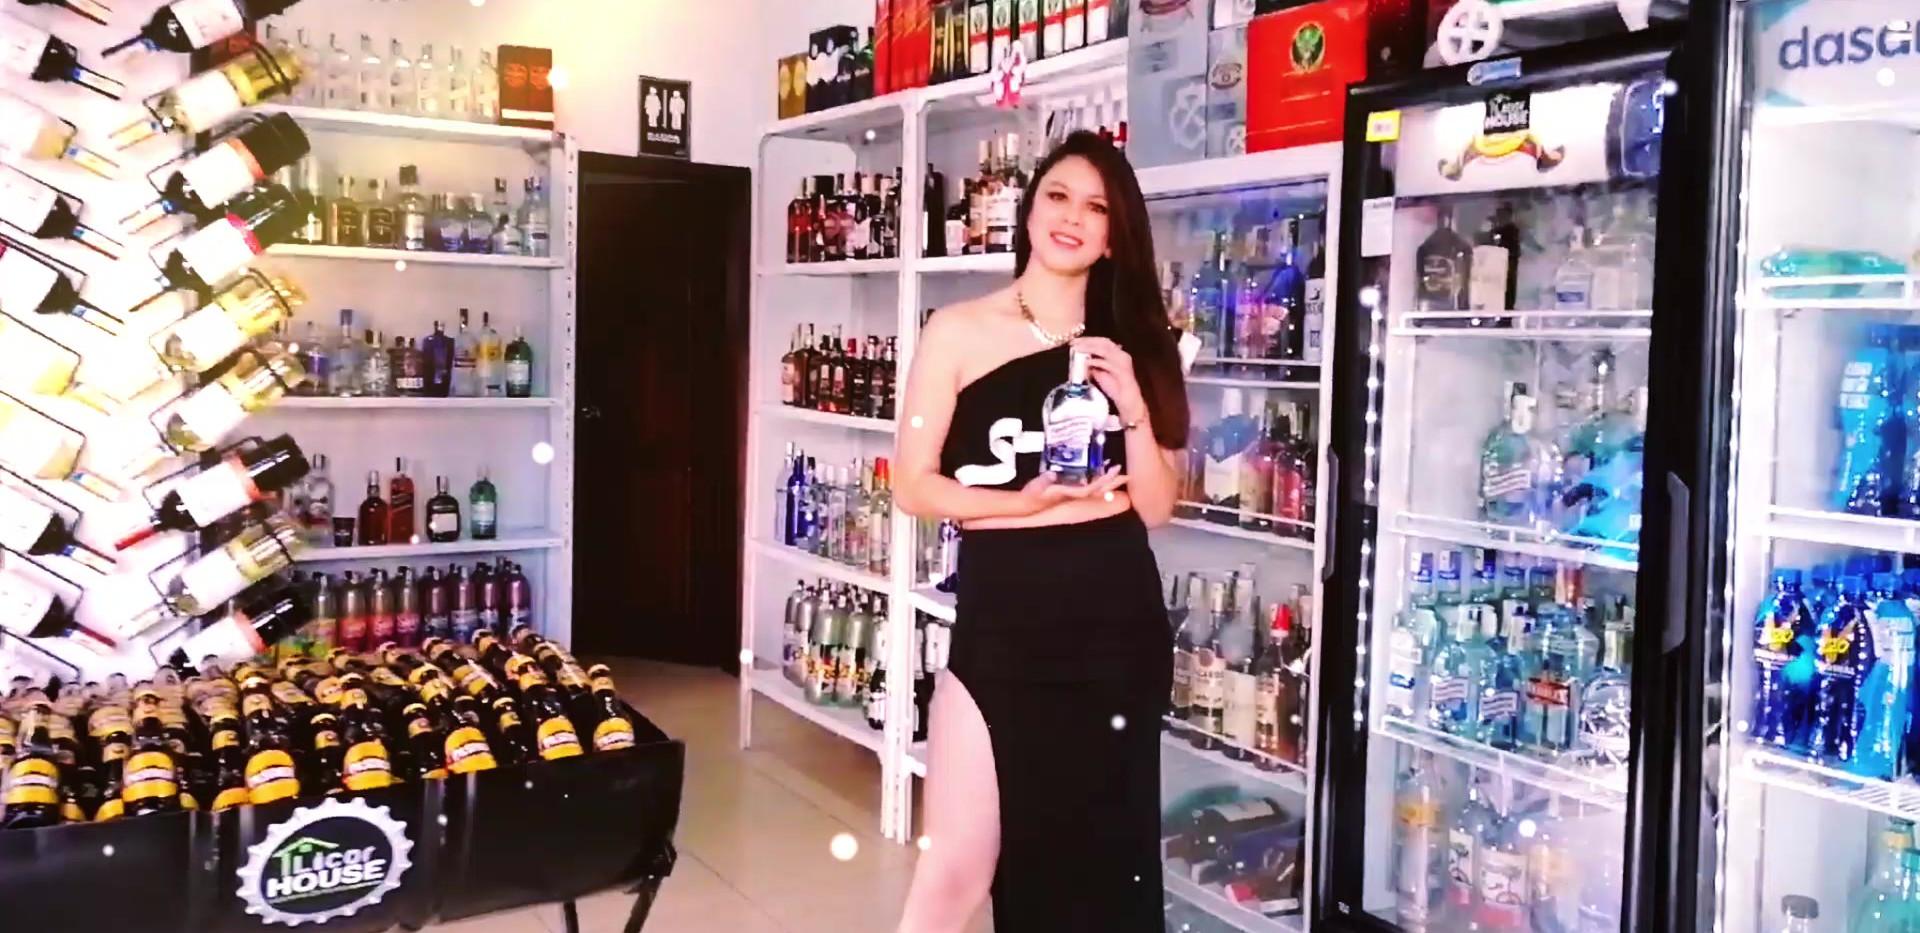 Comercial bebidas LICOR HOUSE CONOCOTO 1